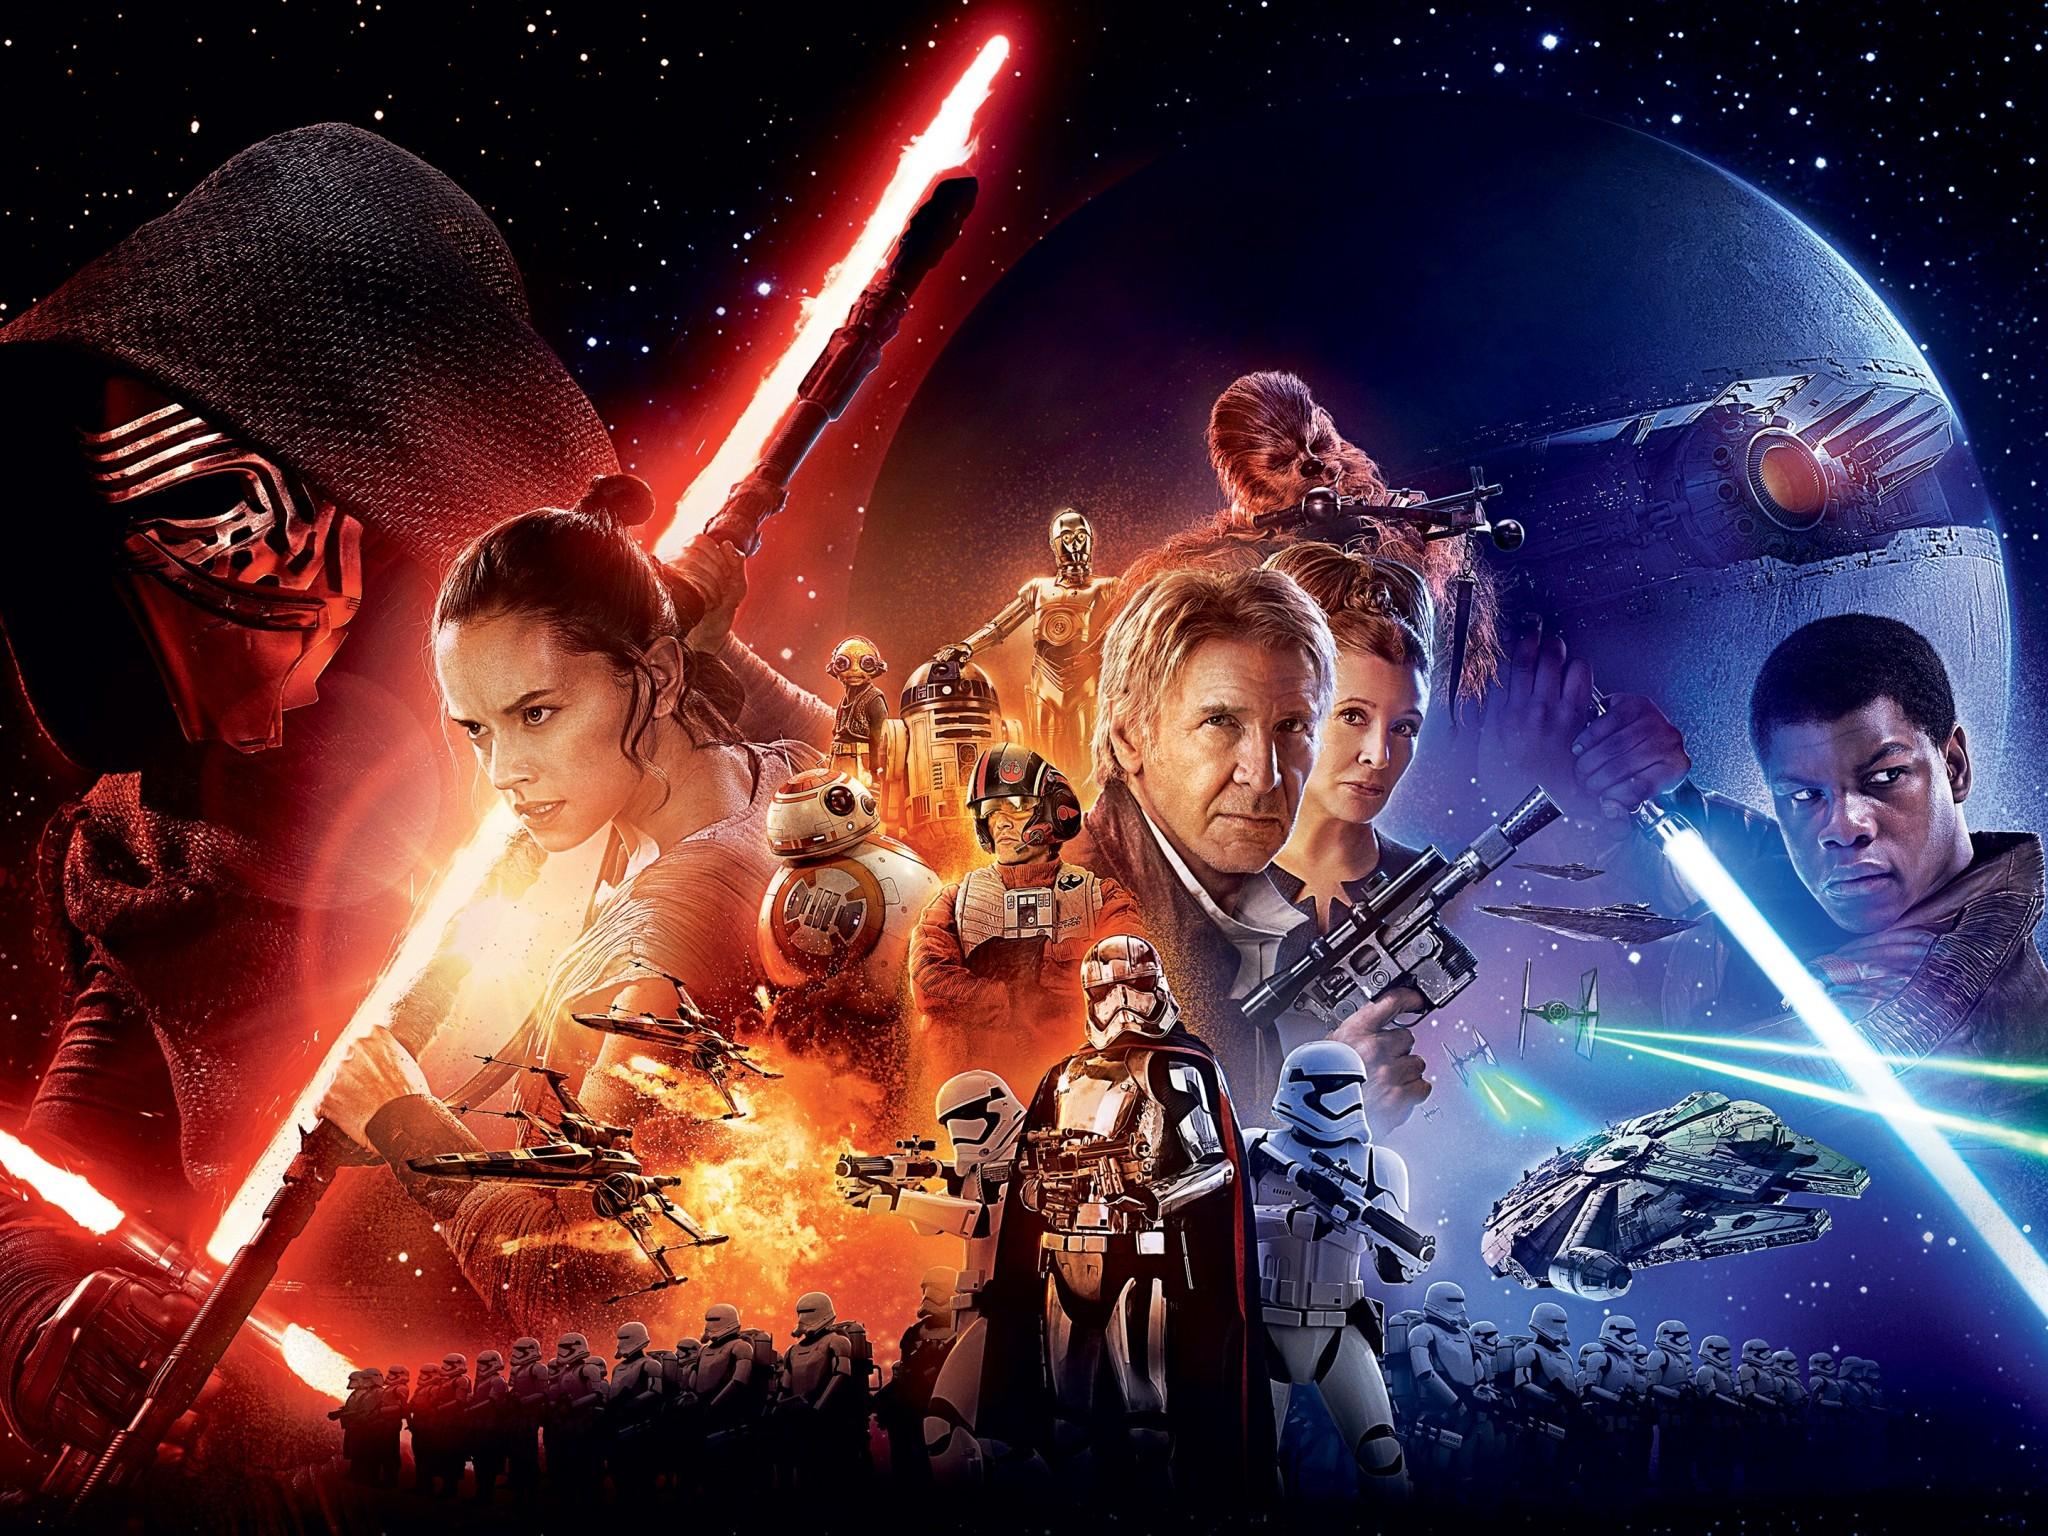 Star Wars The Force Awakens 4K Ultra HD wallpaper 4k WallpaperNet 2048x1536